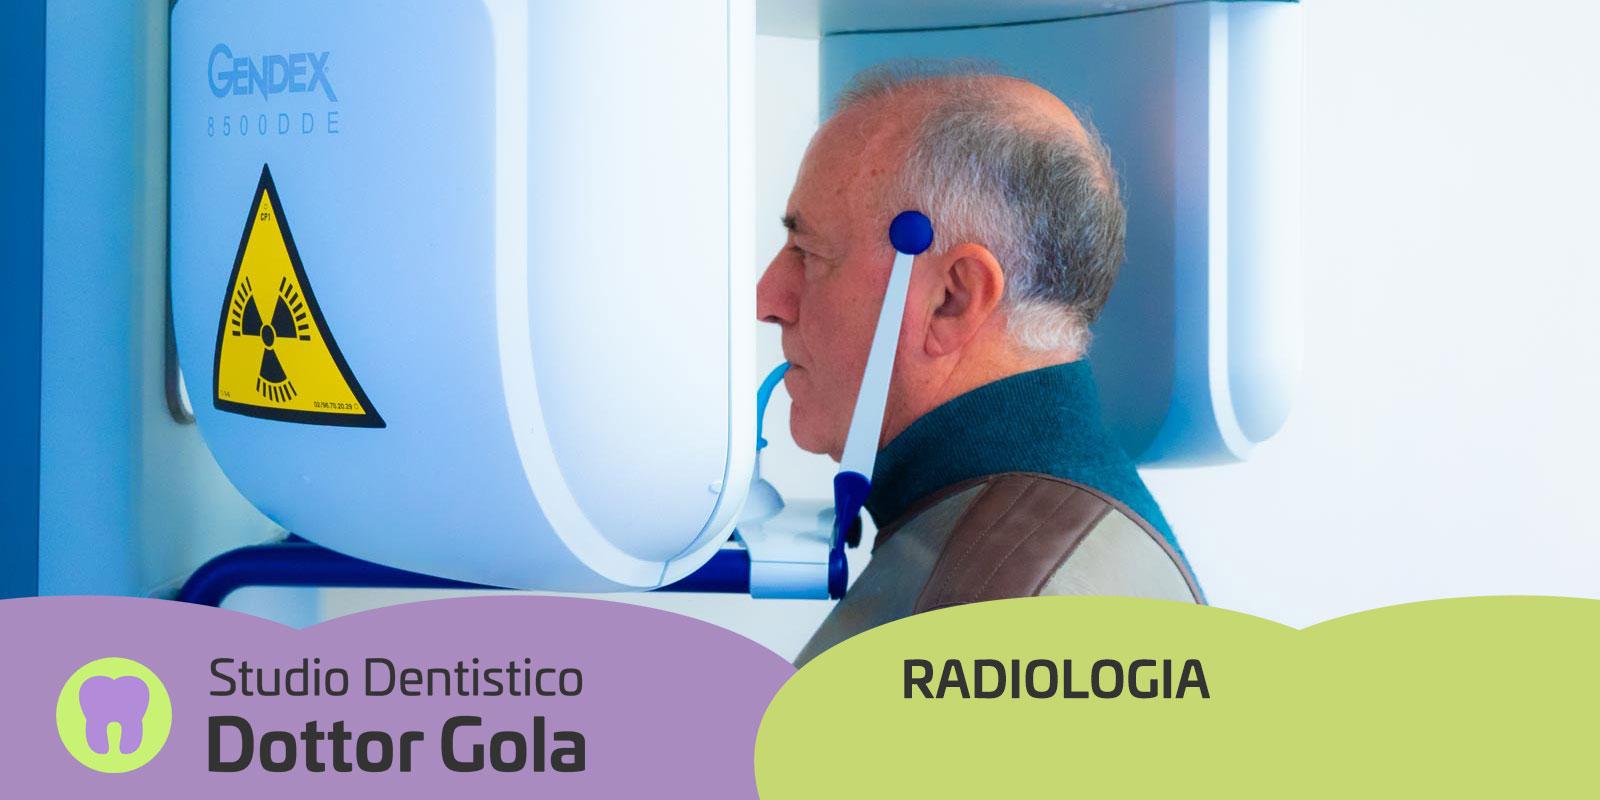 radiologia-dentista-gola-casteggio-pavia